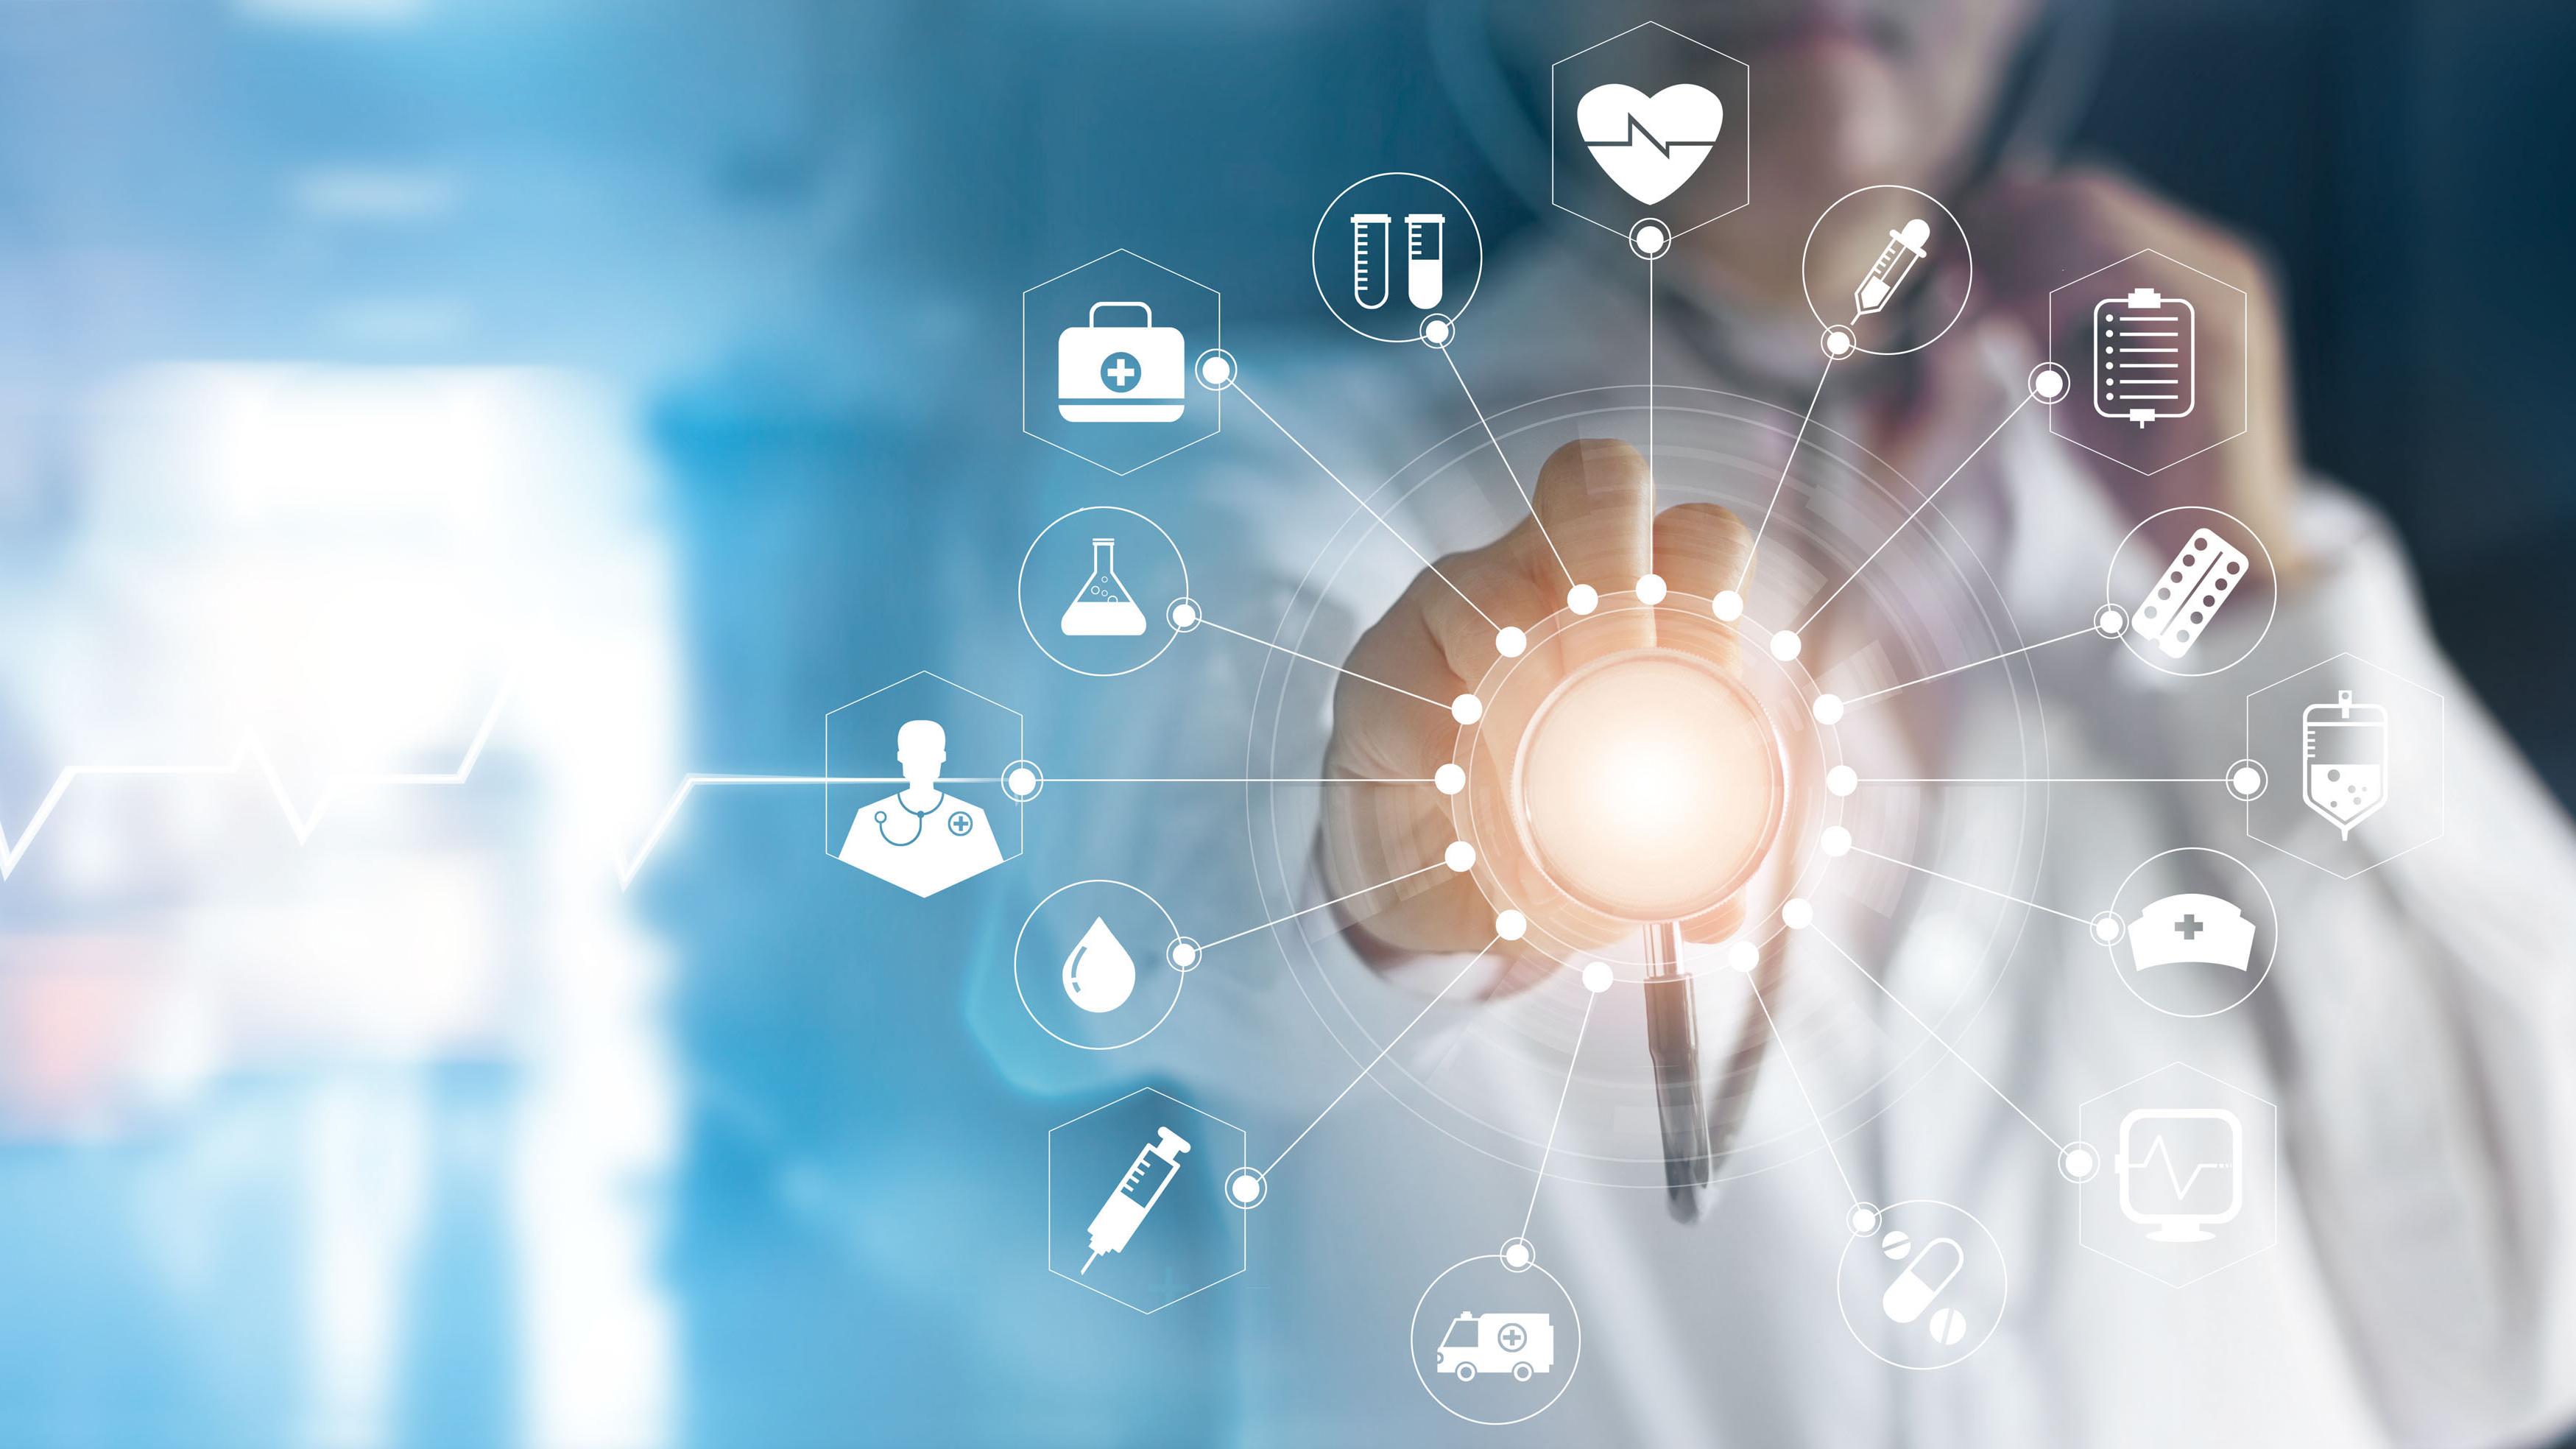 Cumplir RGPD en el sector sanitario